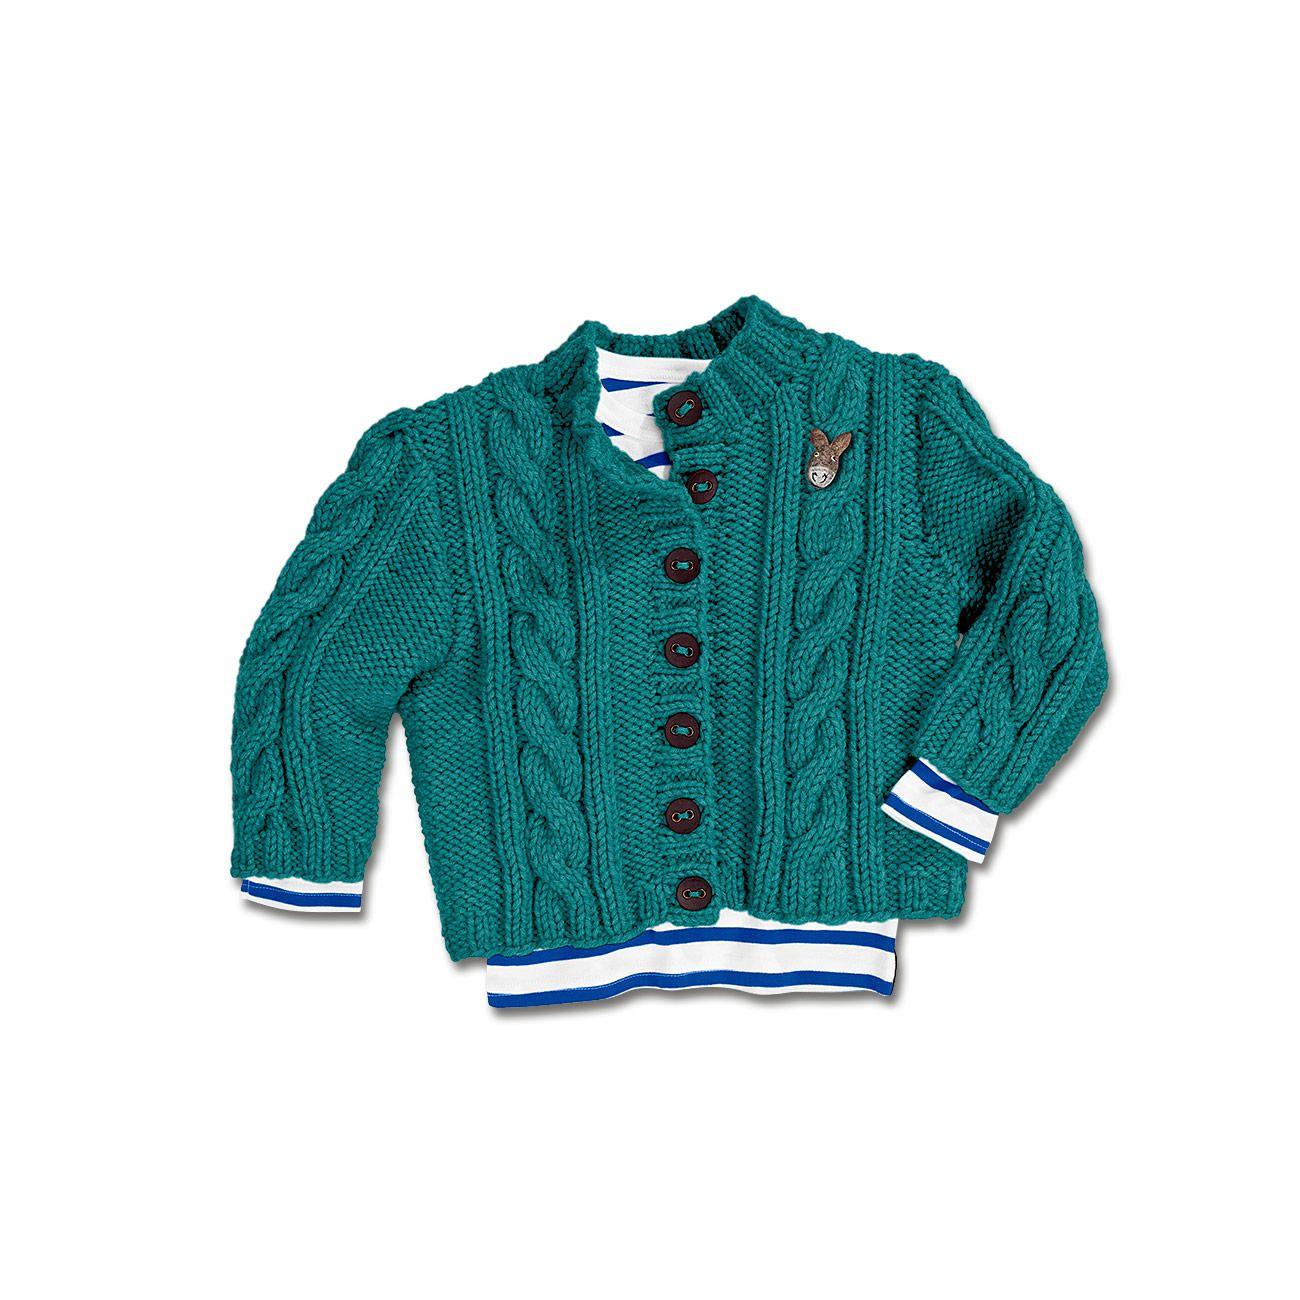 Modell 060/5, Kinderjacke aus Merino Dick von Junghans-Wolle